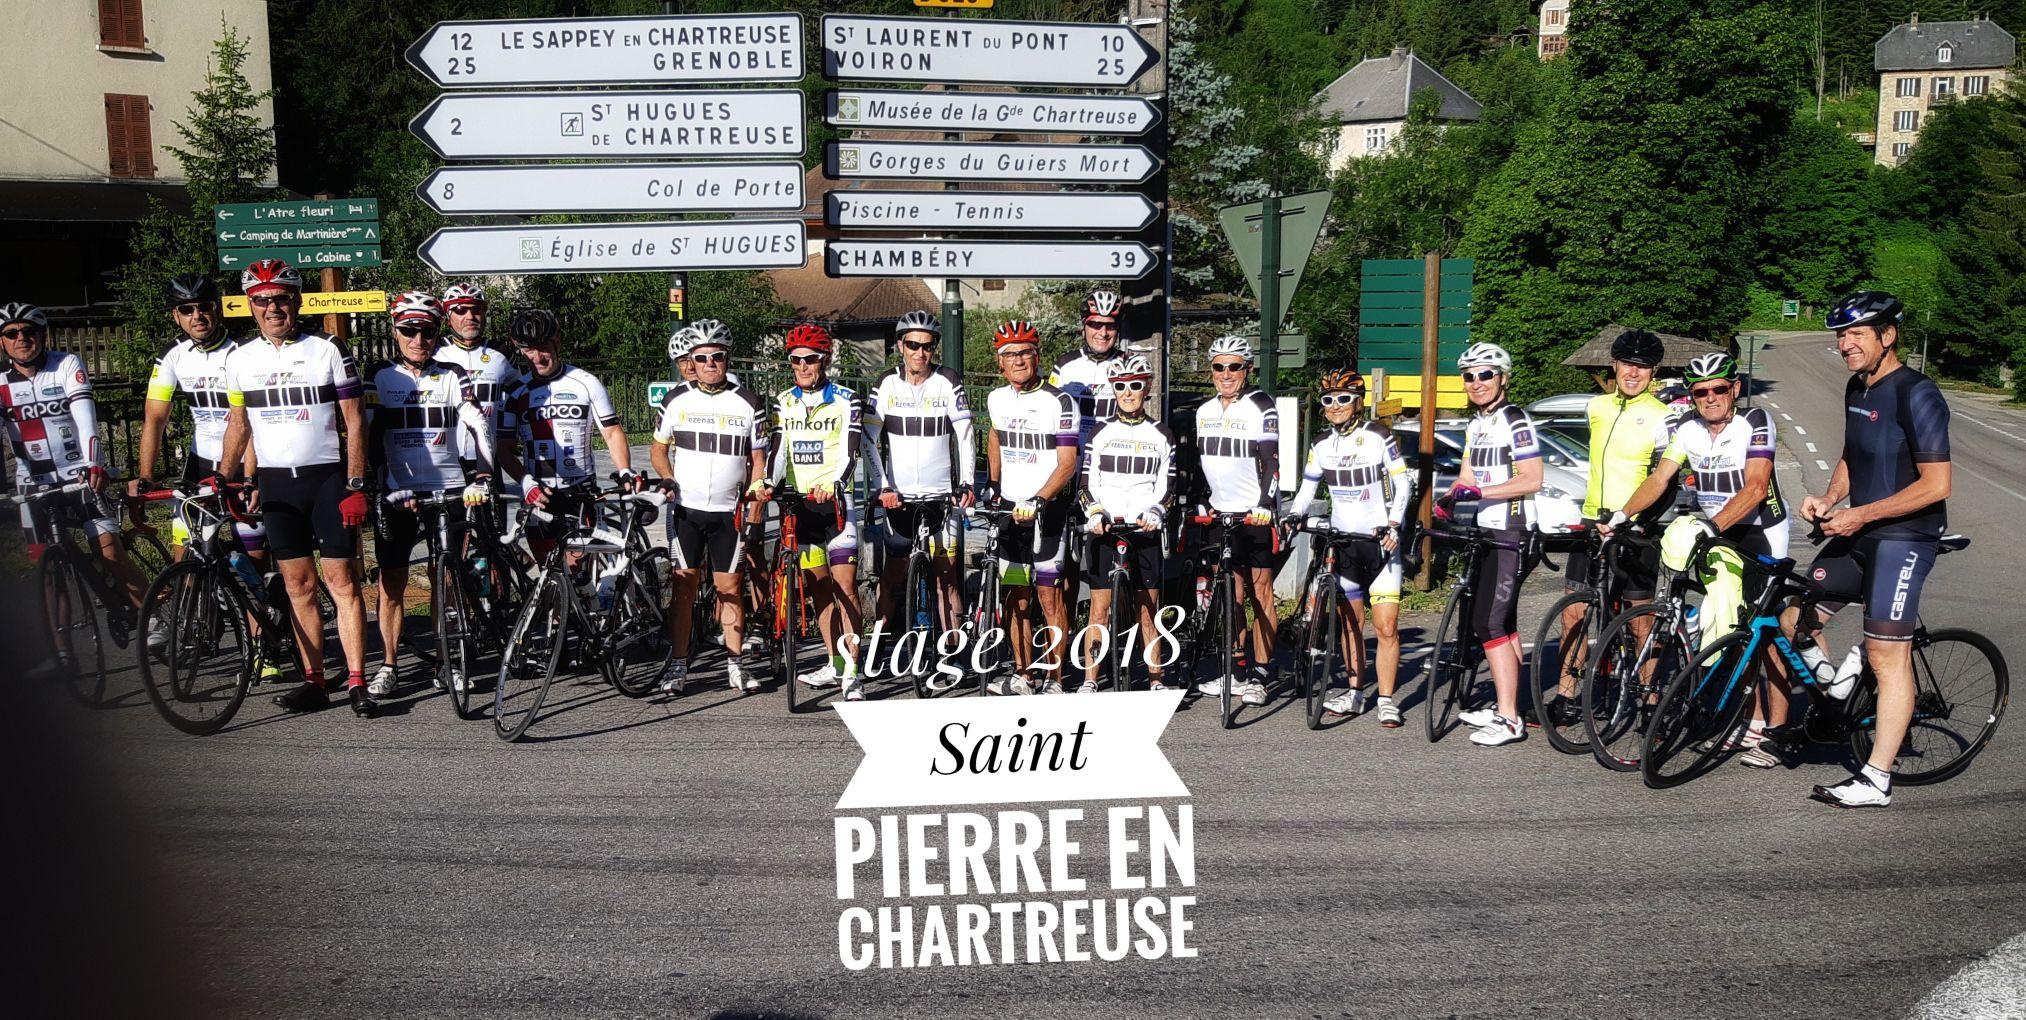 Stage d'Entraînement 2018 en Chartreuse.